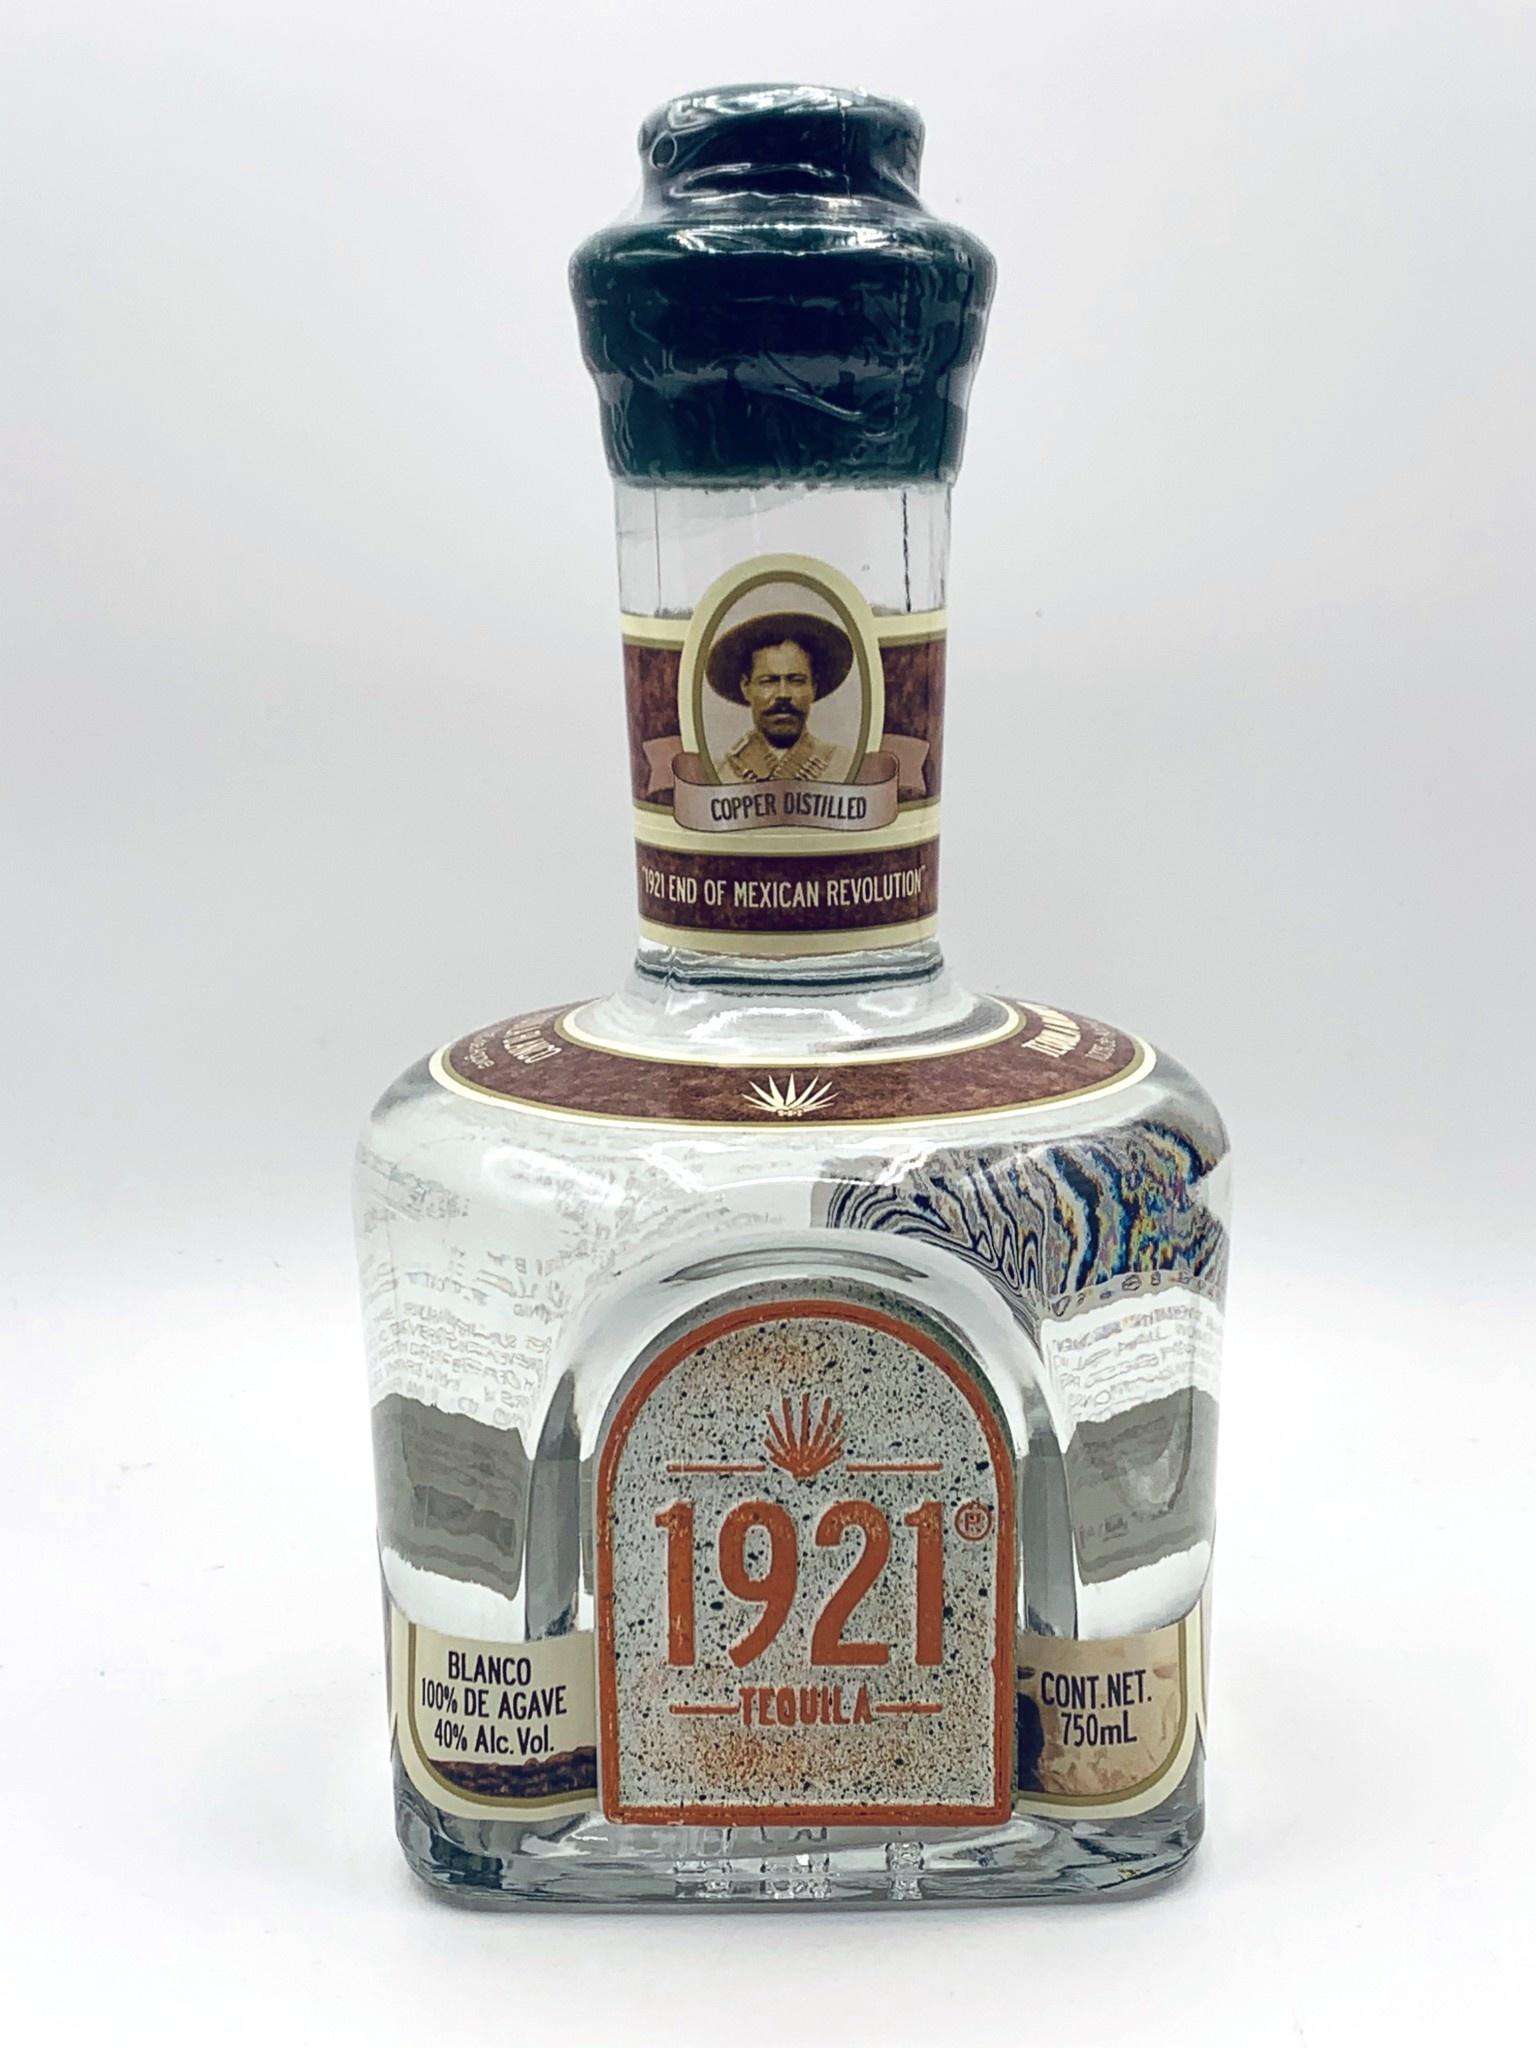 Tequila 1921 Copper Still Blanco 750ml (80 Proof)